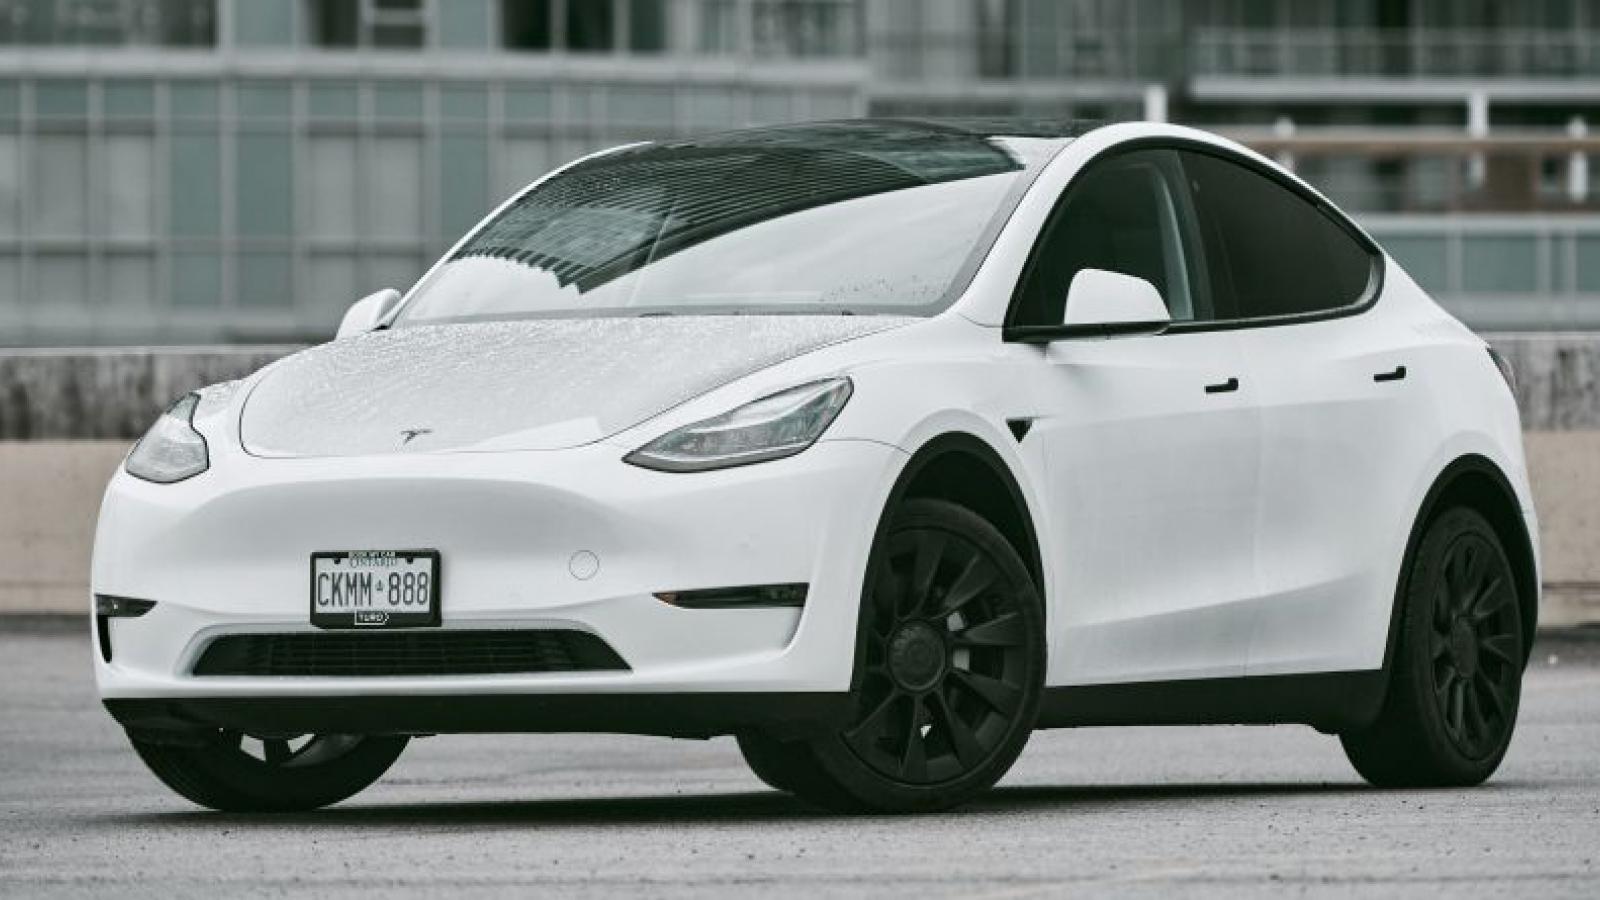 Tesla ghi nhận doanh số kỷ lục trong quý II năm 2021